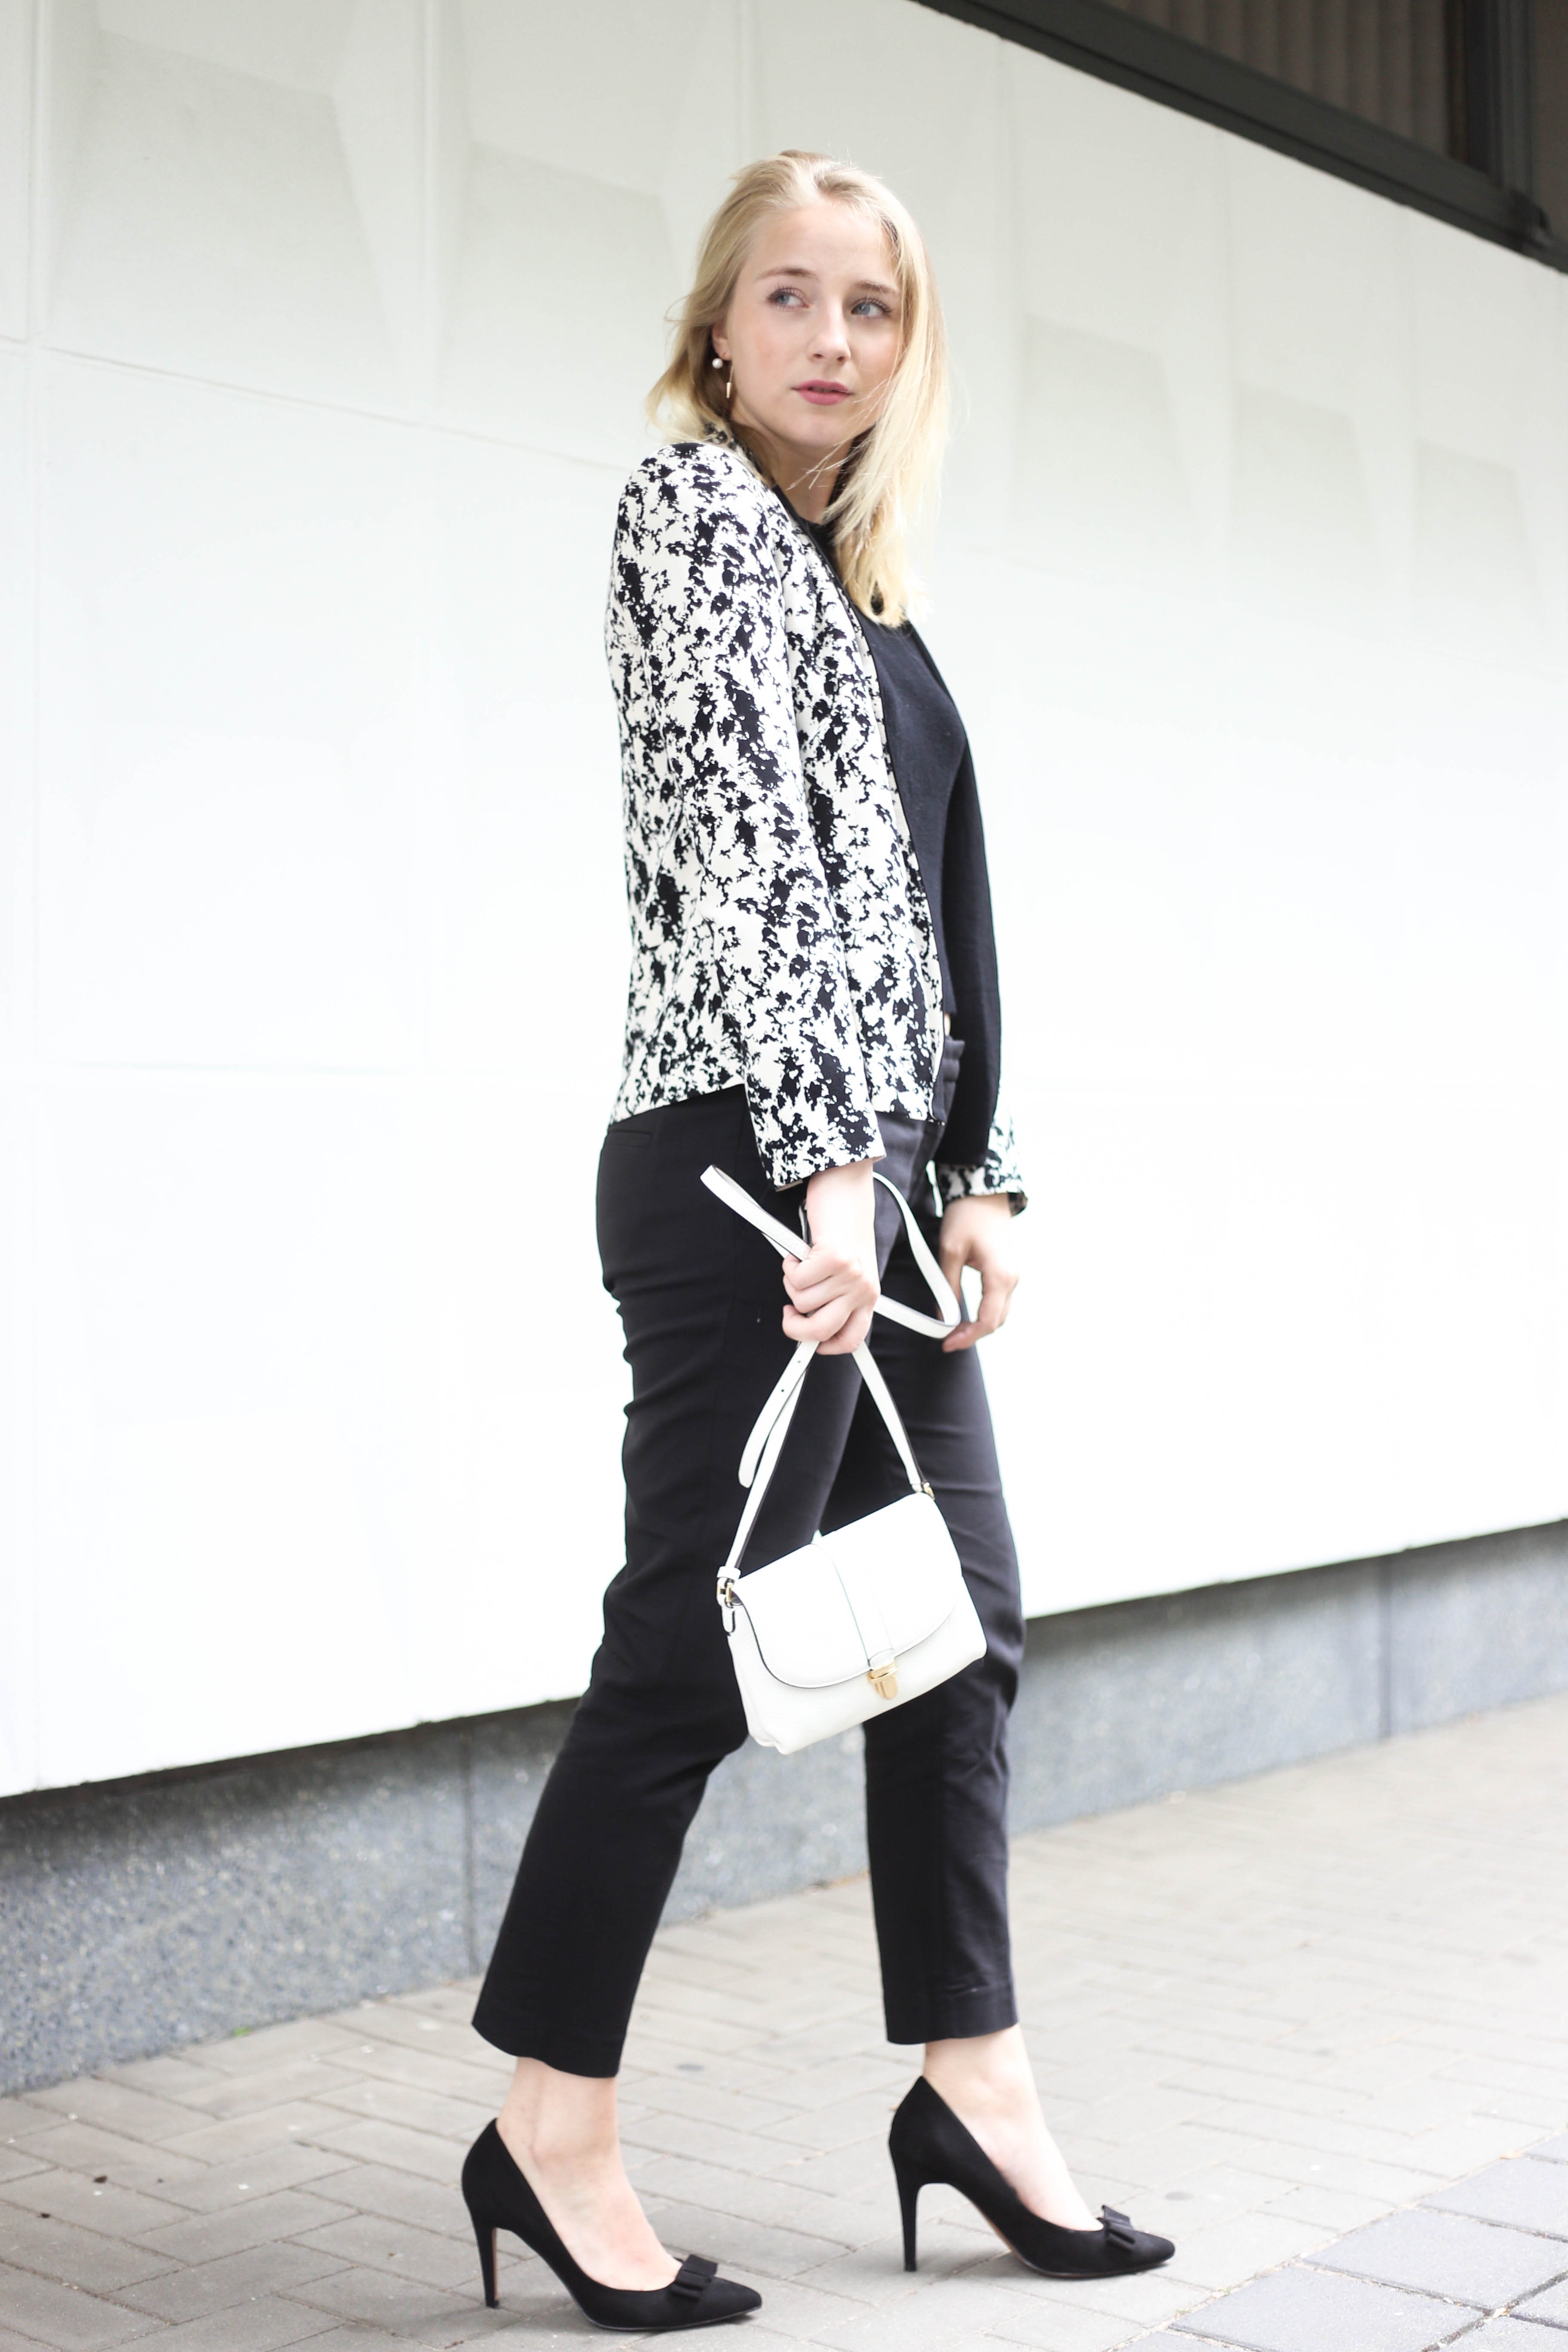 anzugshose-alltag-dalmatiner-blazer-outfit-fashionblog-berlin-köln_2081